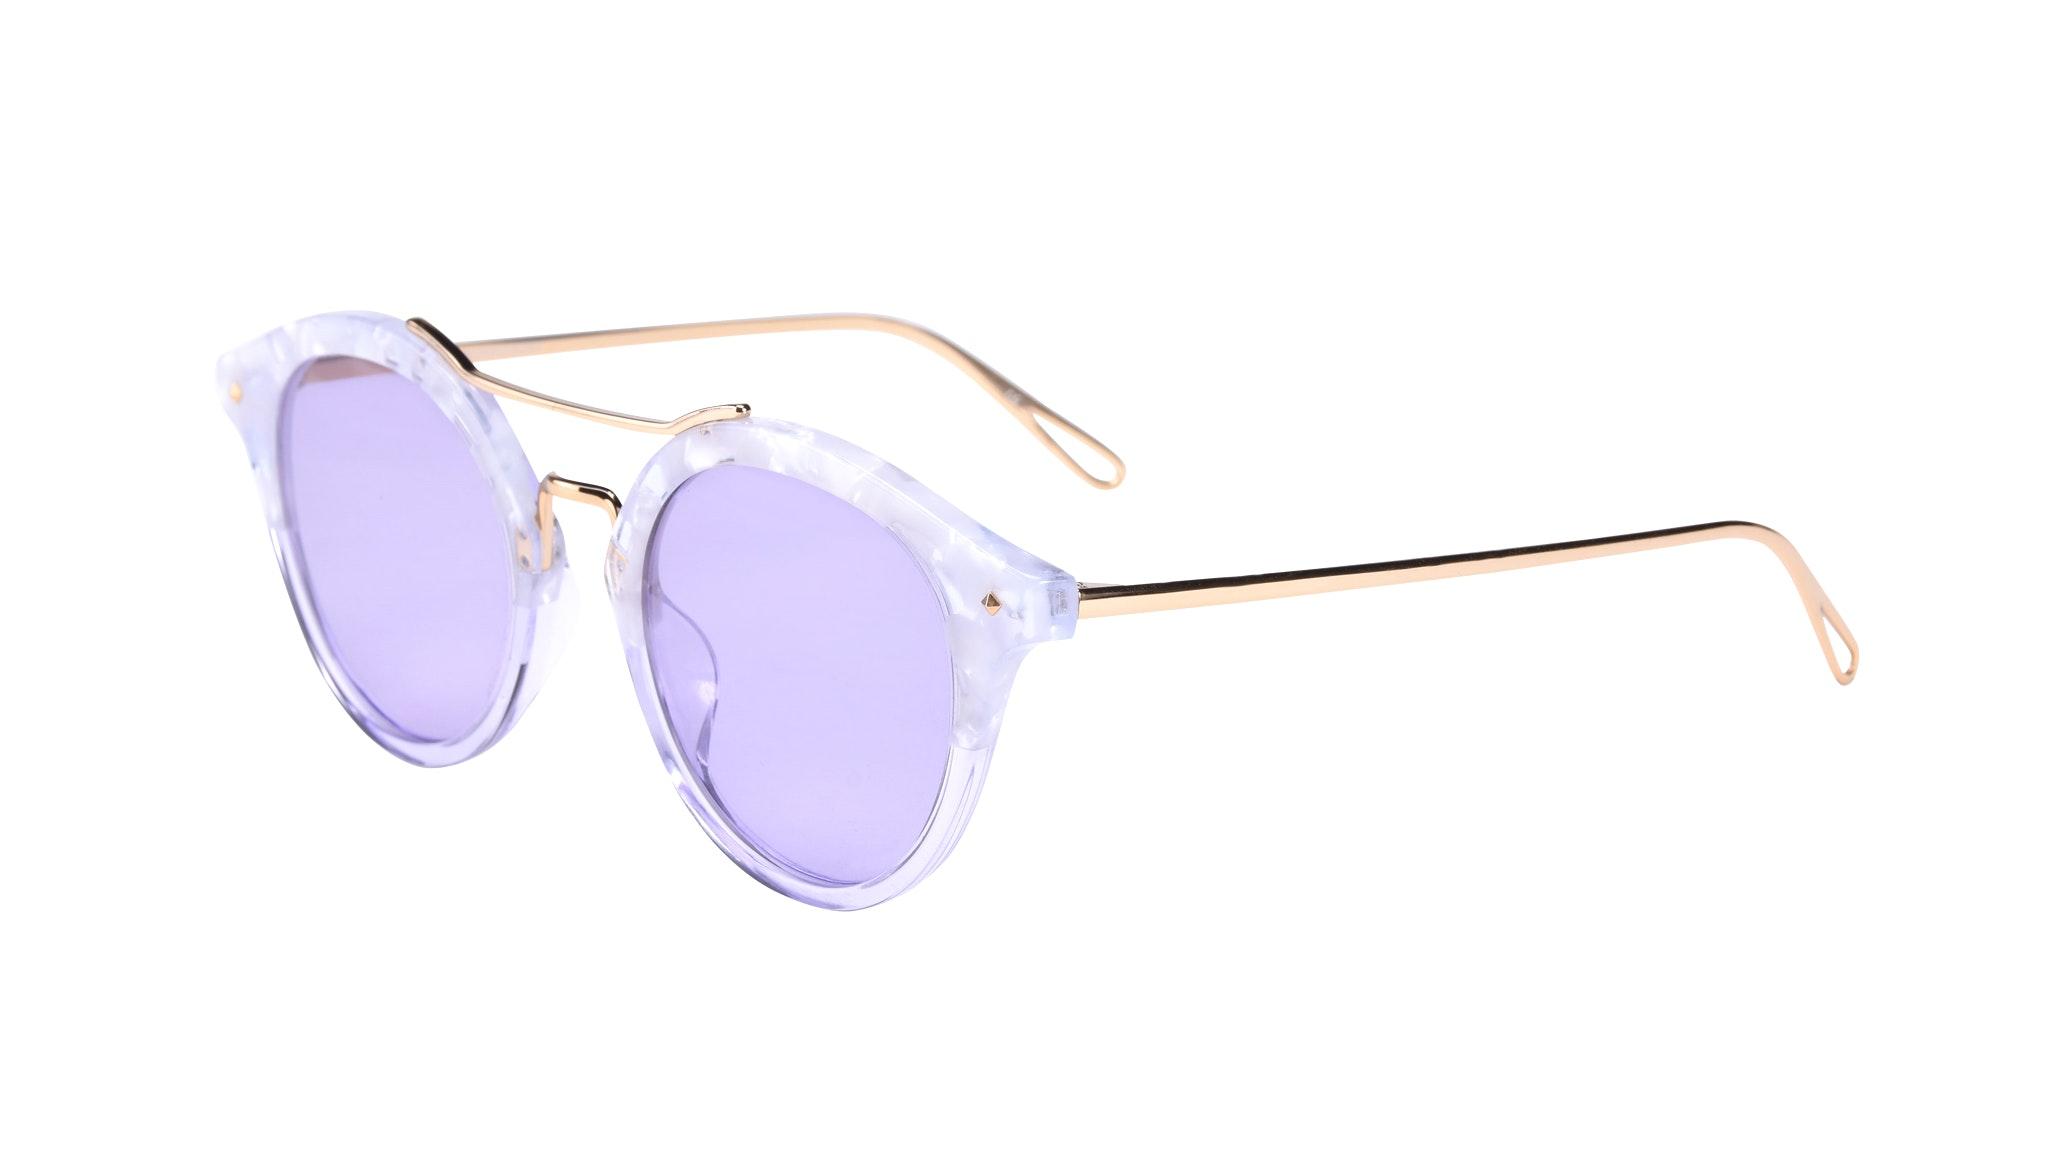 Affordable Fashion Glasses Round Sunglasses Women Infinite Moonlight Tilt